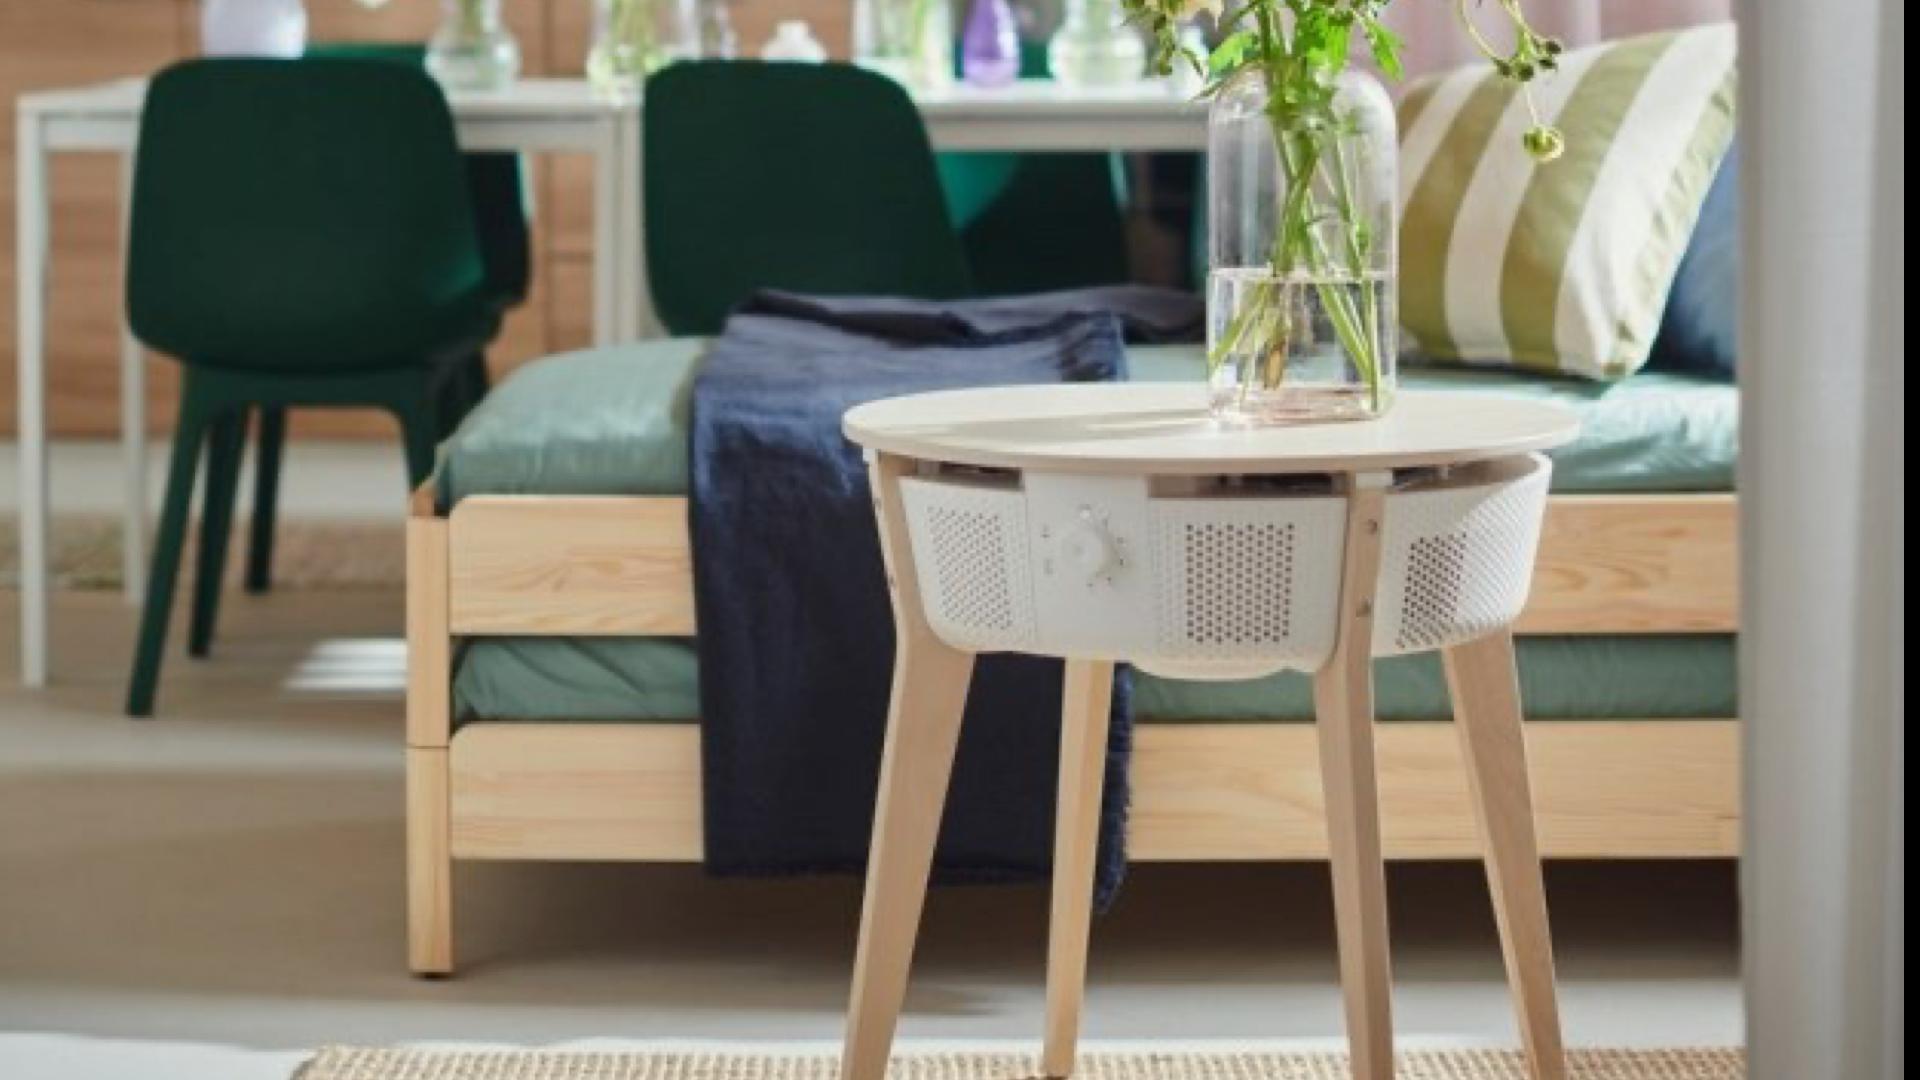 ikea air purifier table